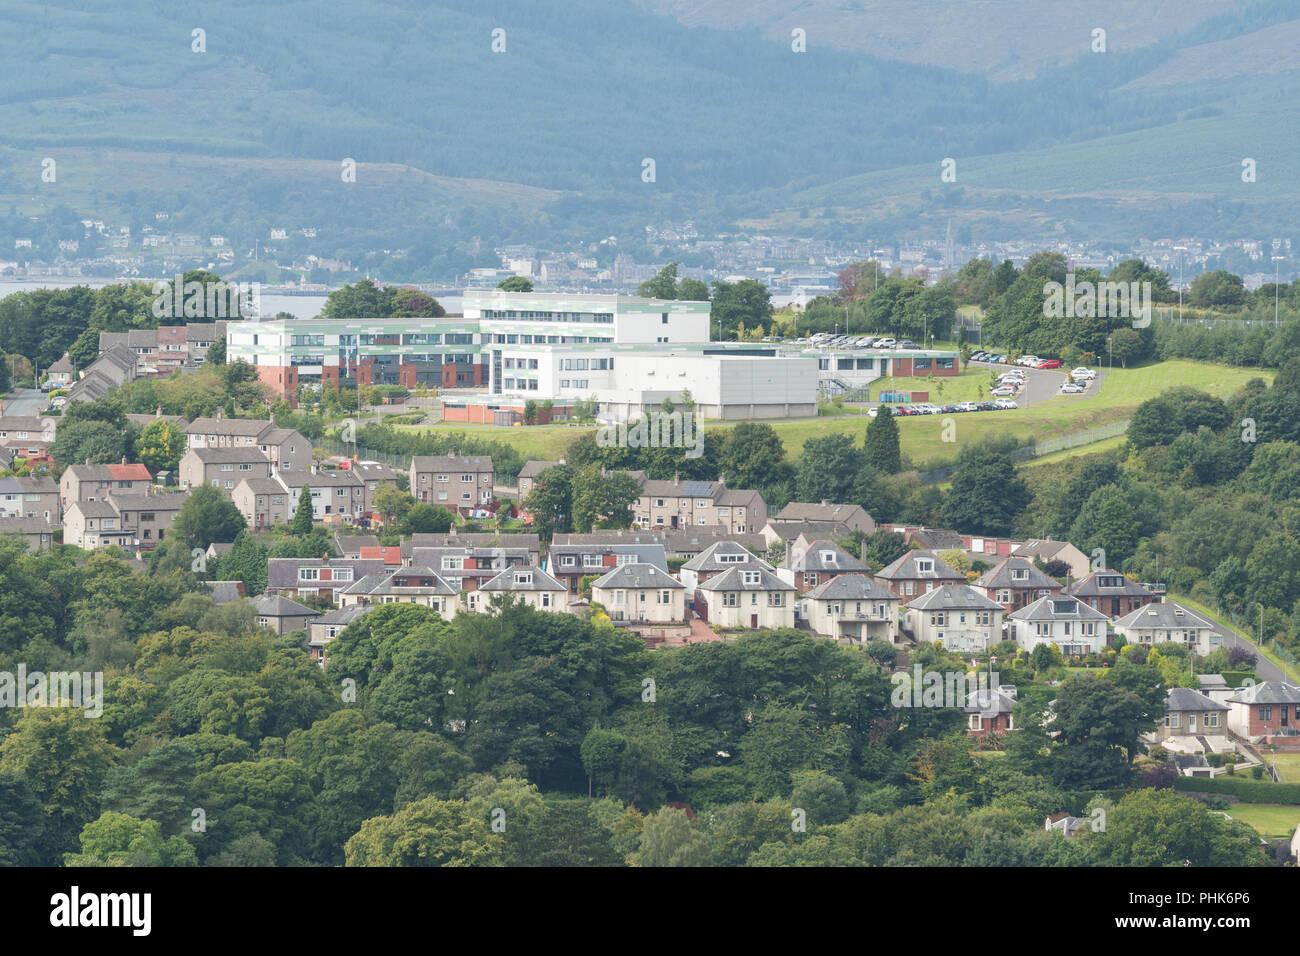 St Columbas High School - a Roman Catholic comprehensive school in Gourock, Scotland, UK - Stock Image